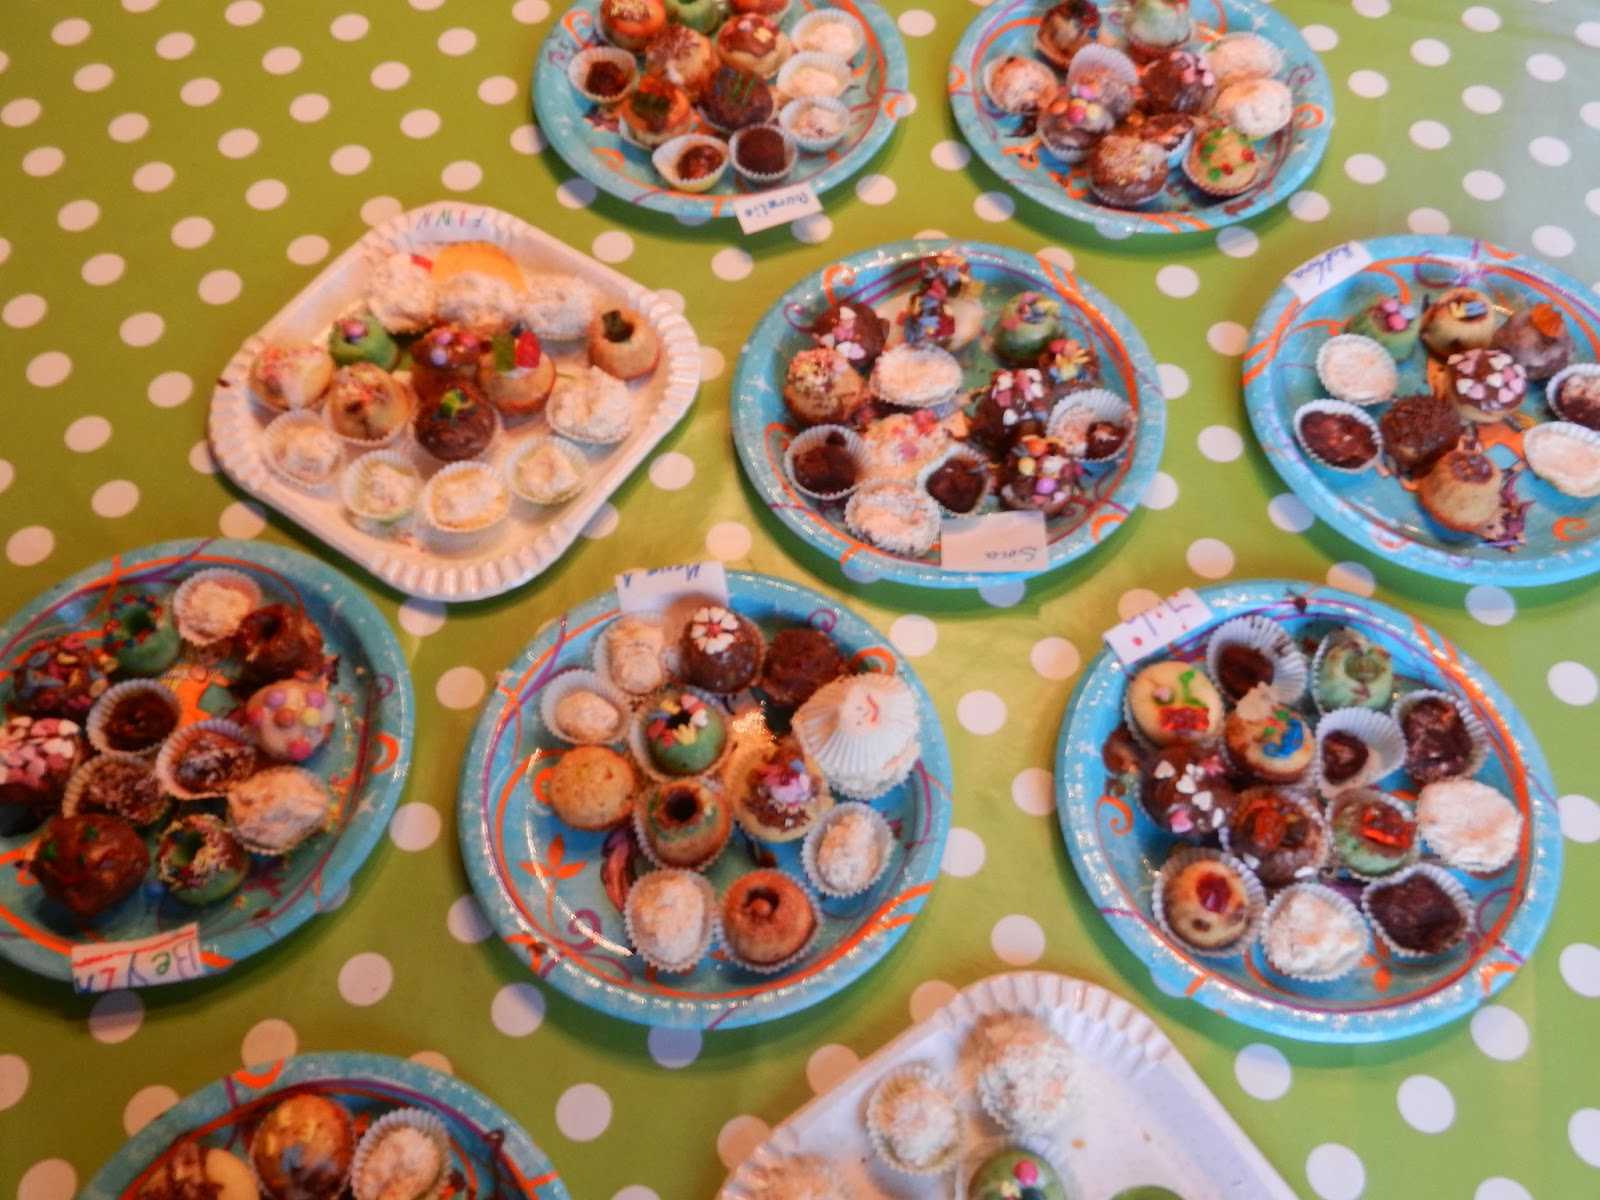 fanny 39 s bandennotizen mini muffin party viel spa am kindergeburtstag. Black Bedroom Furniture Sets. Home Design Ideas